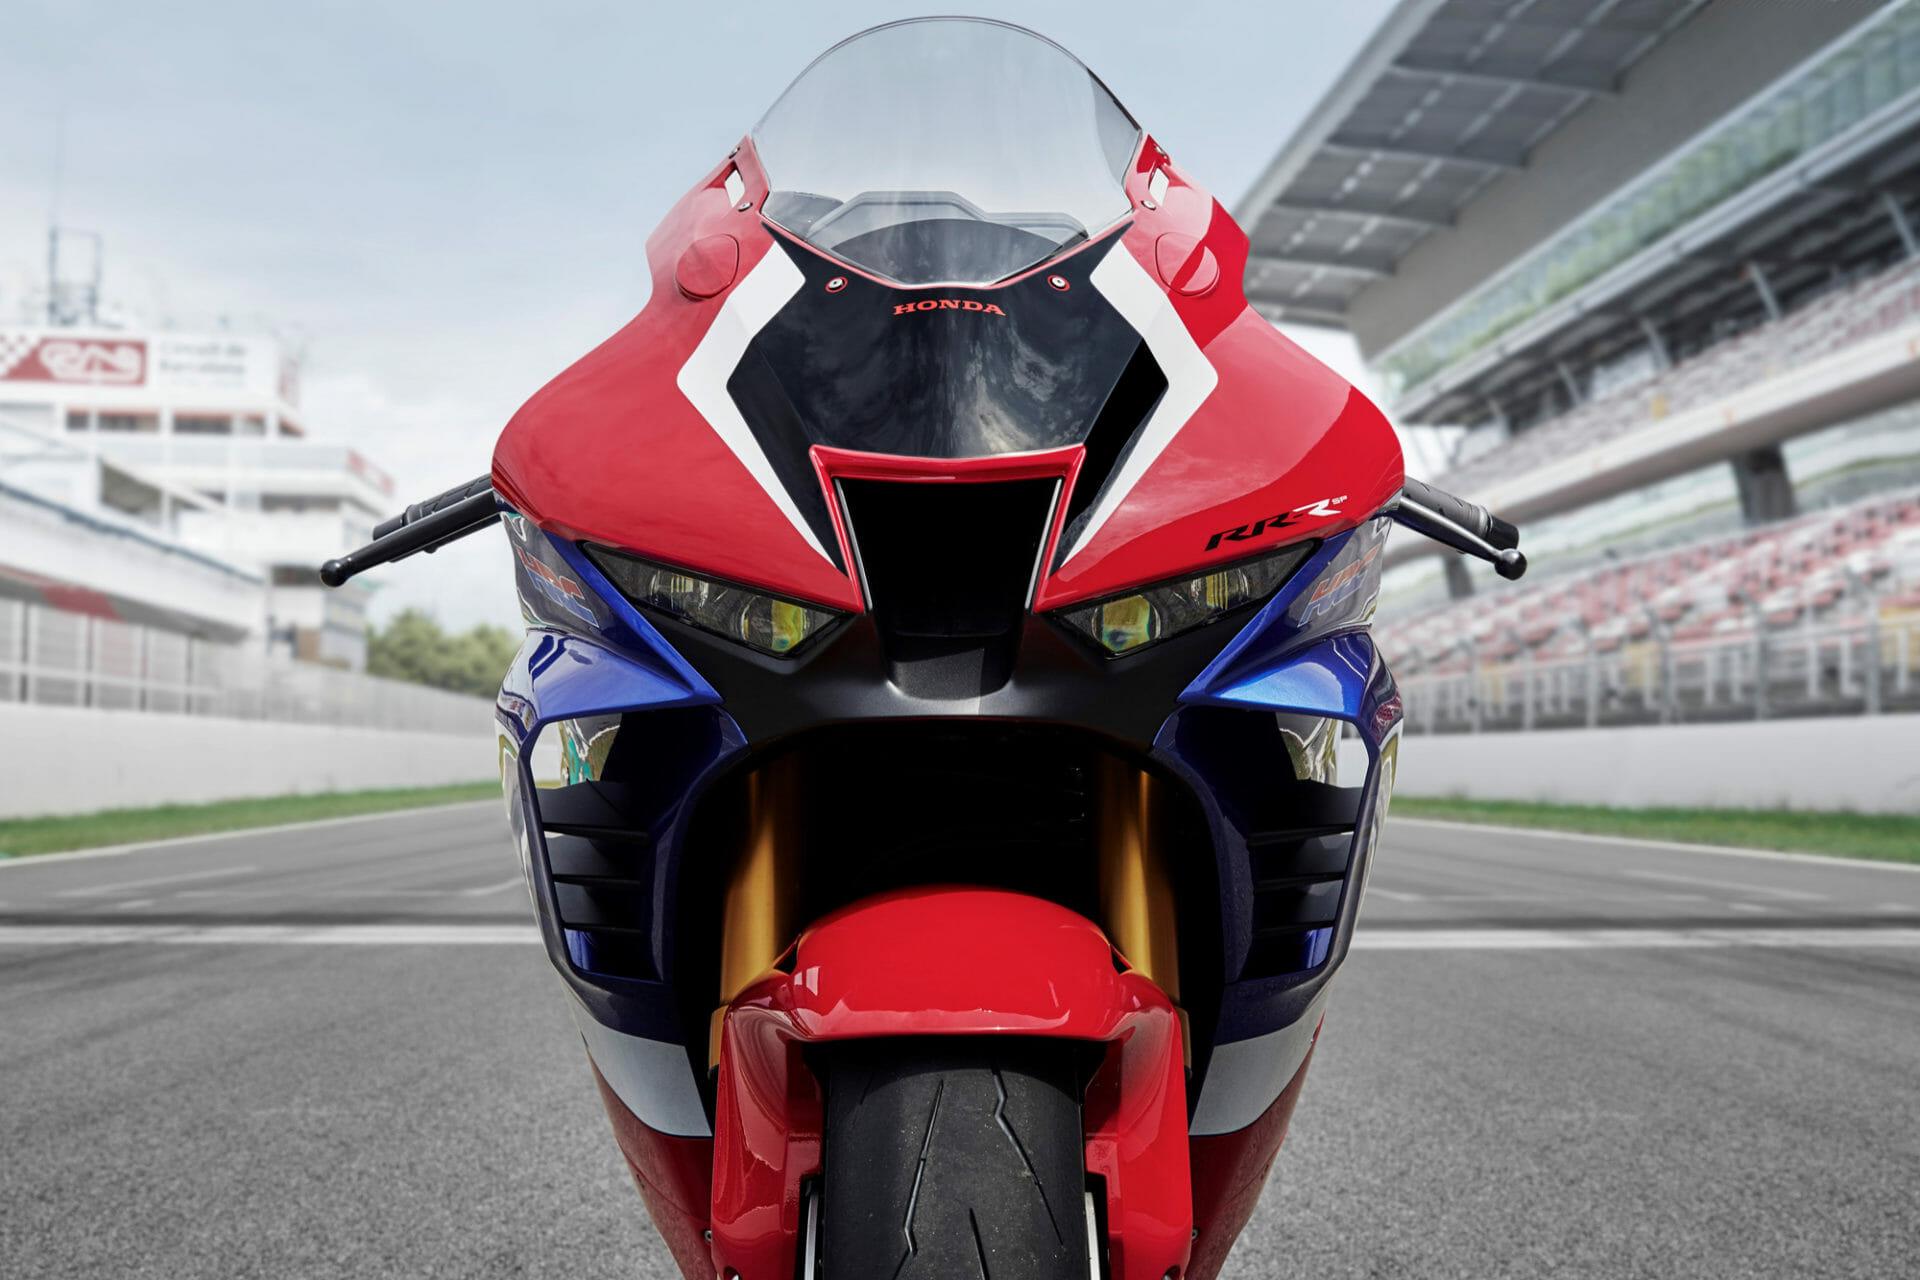 Honda Cbr1000rr R Fireblade Presented Motorcycles News Motorcycle Magazine